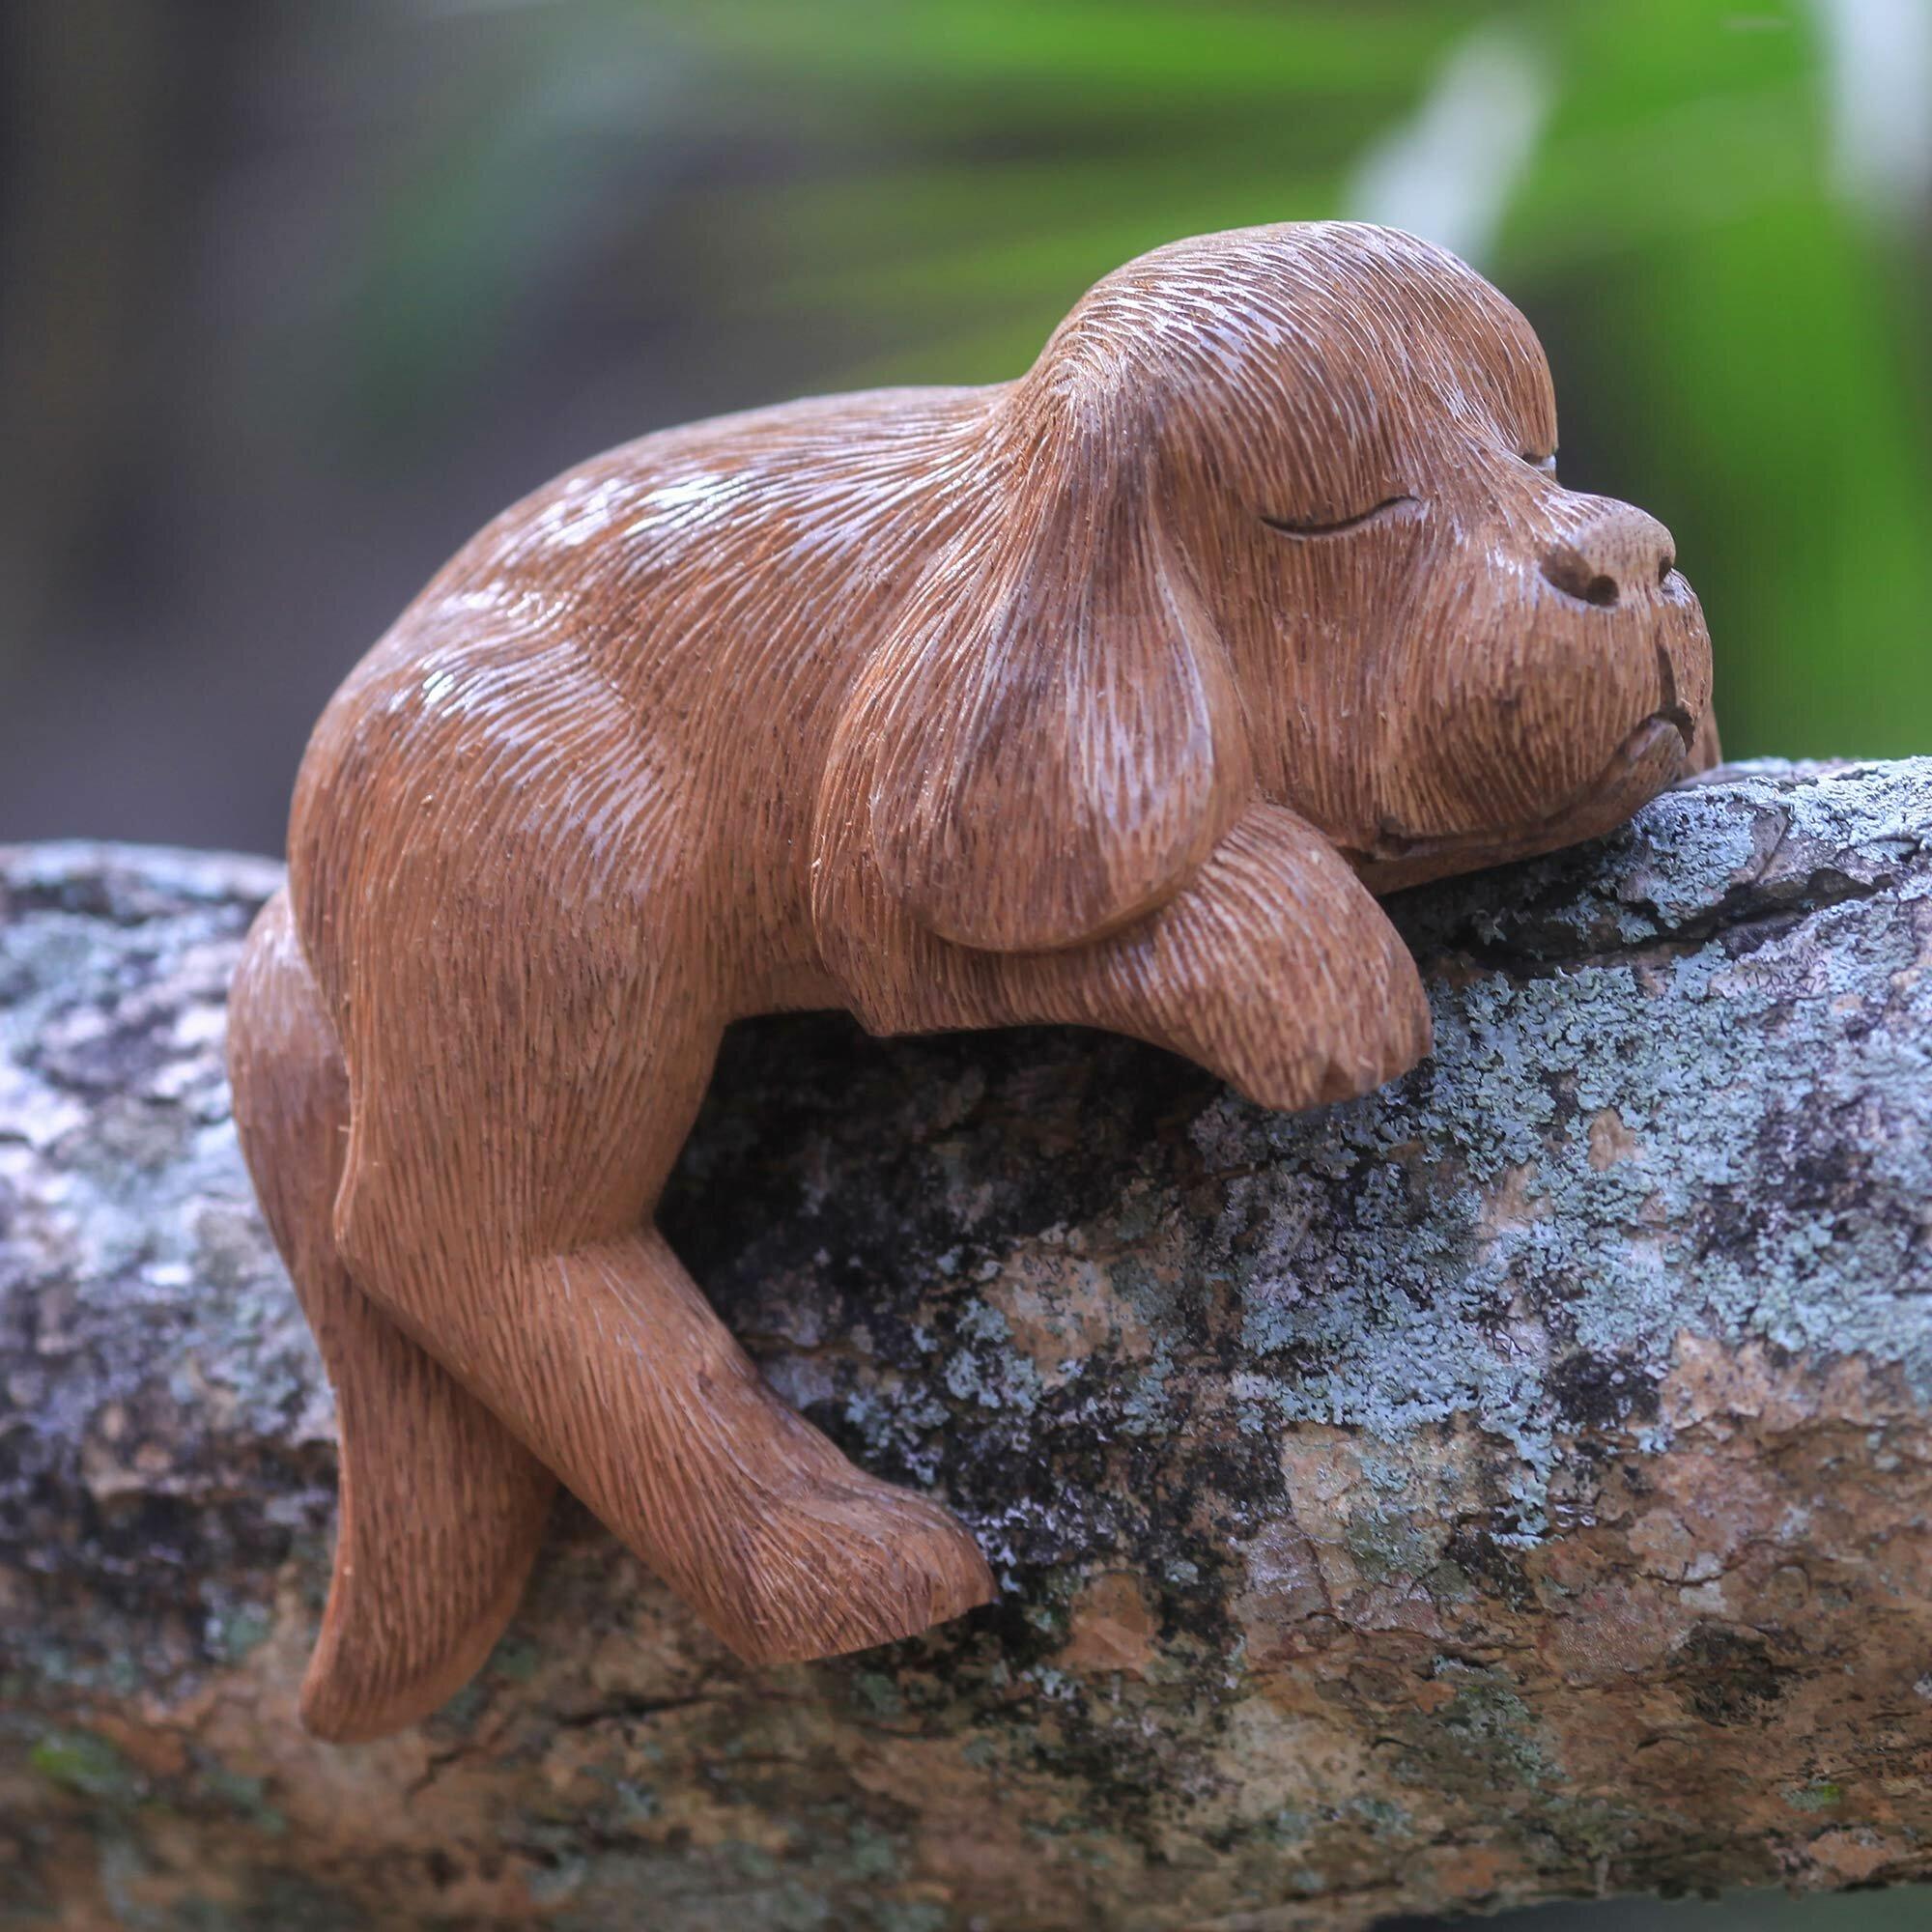 Red Barrel Studio Analise Sleepy Cocker Spaniel Puppy Hand Carved In Wood Figurine